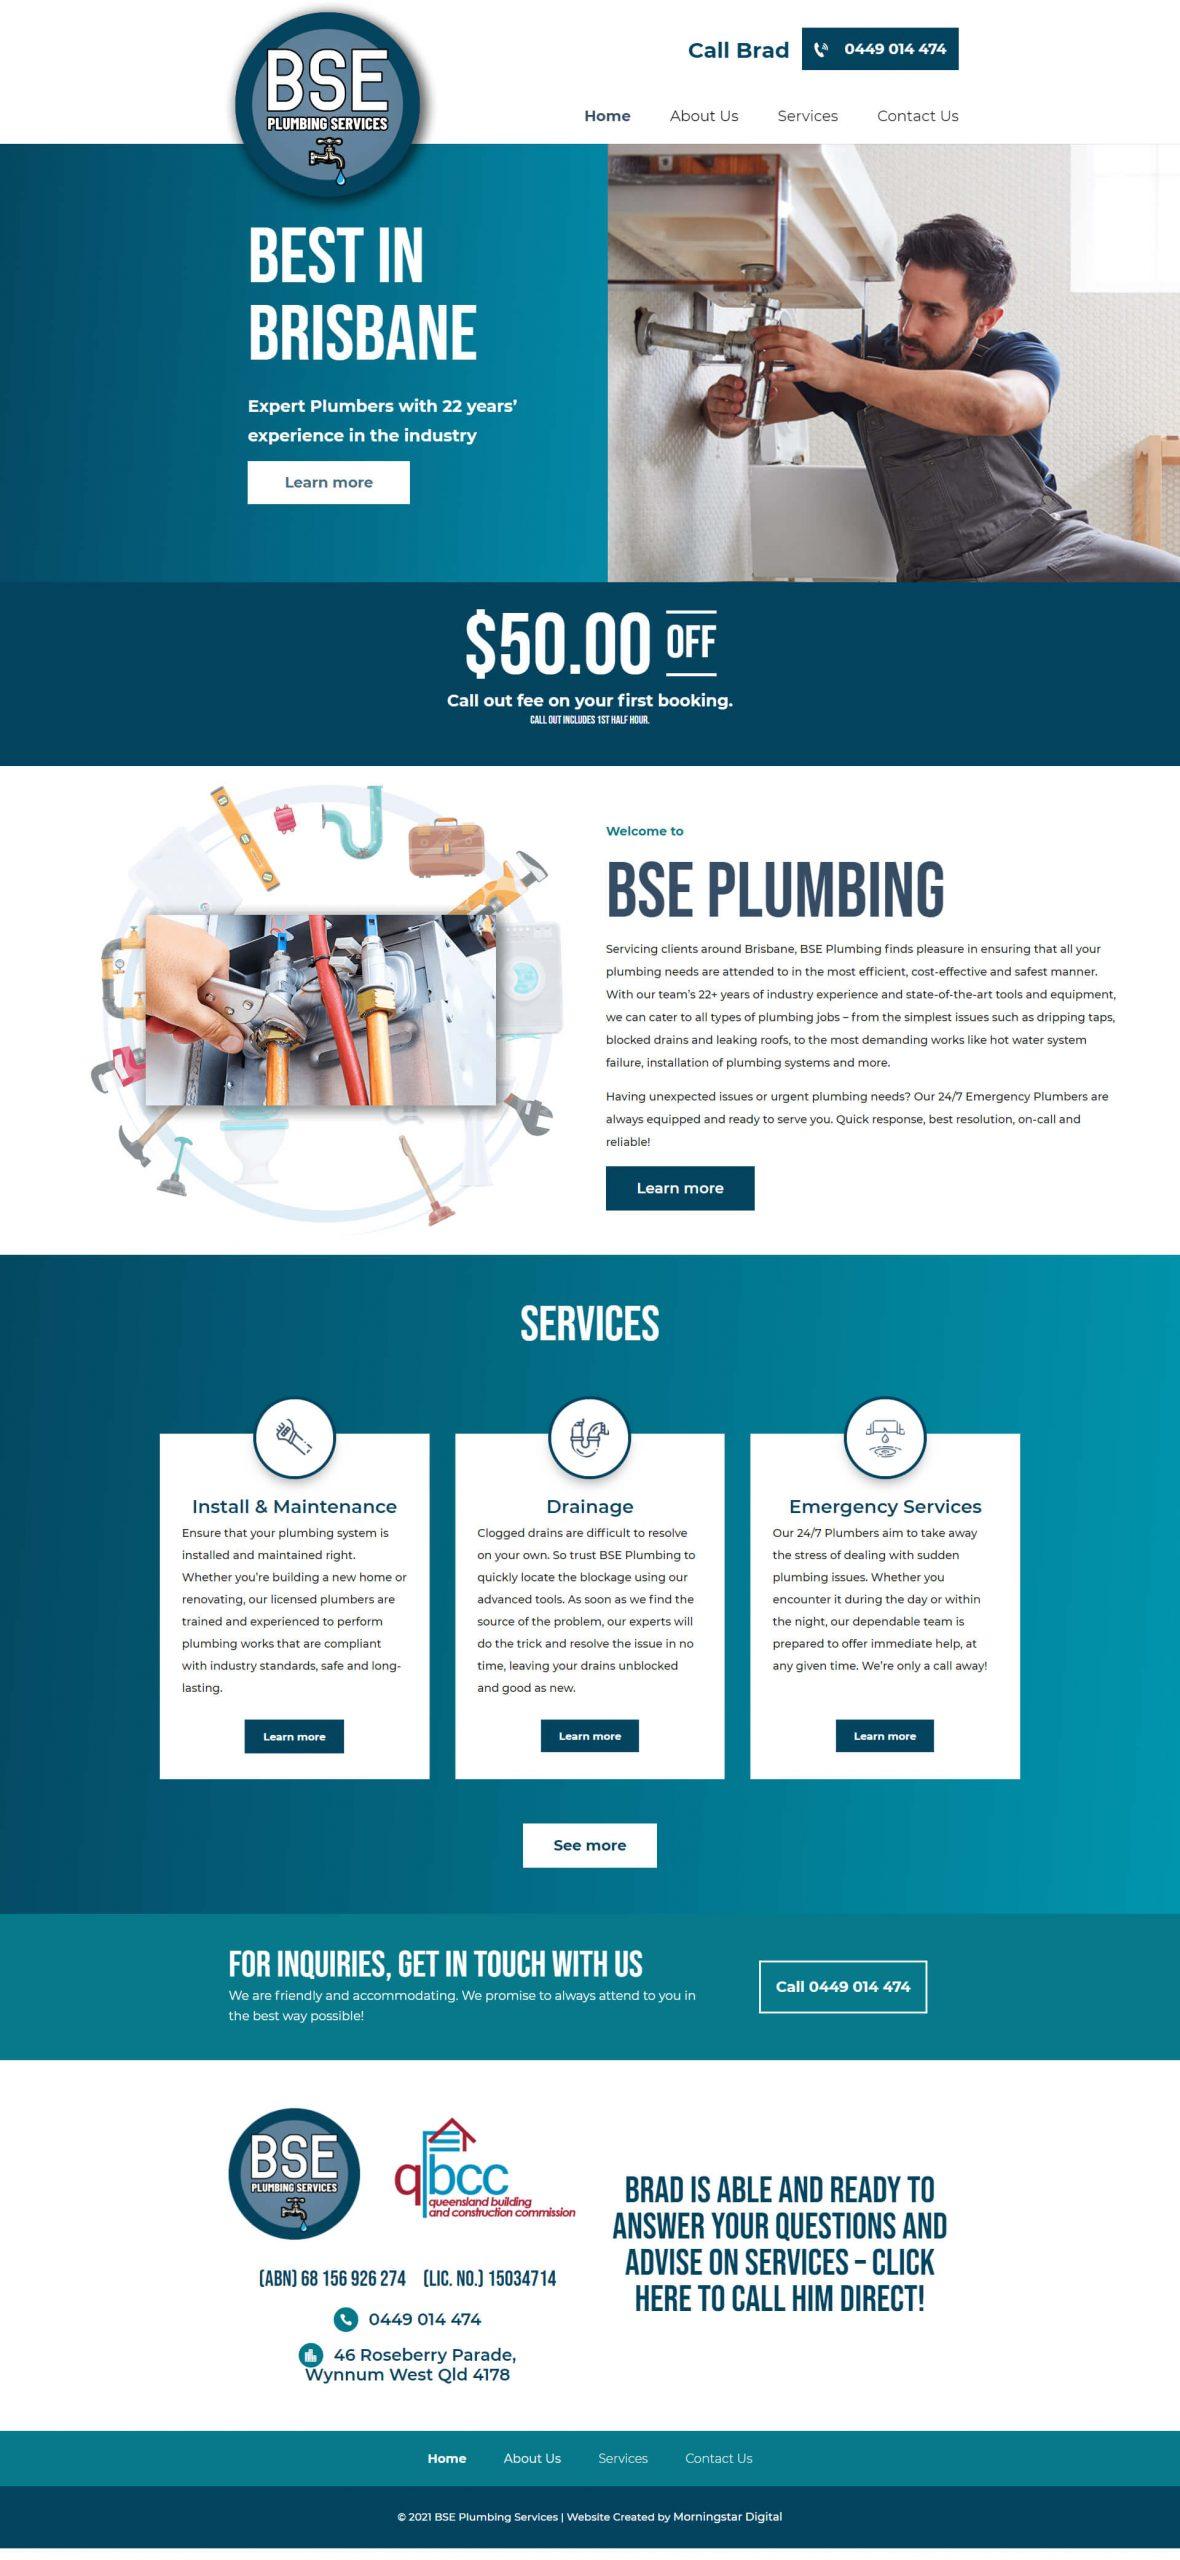 BSEPlumbing Homepage